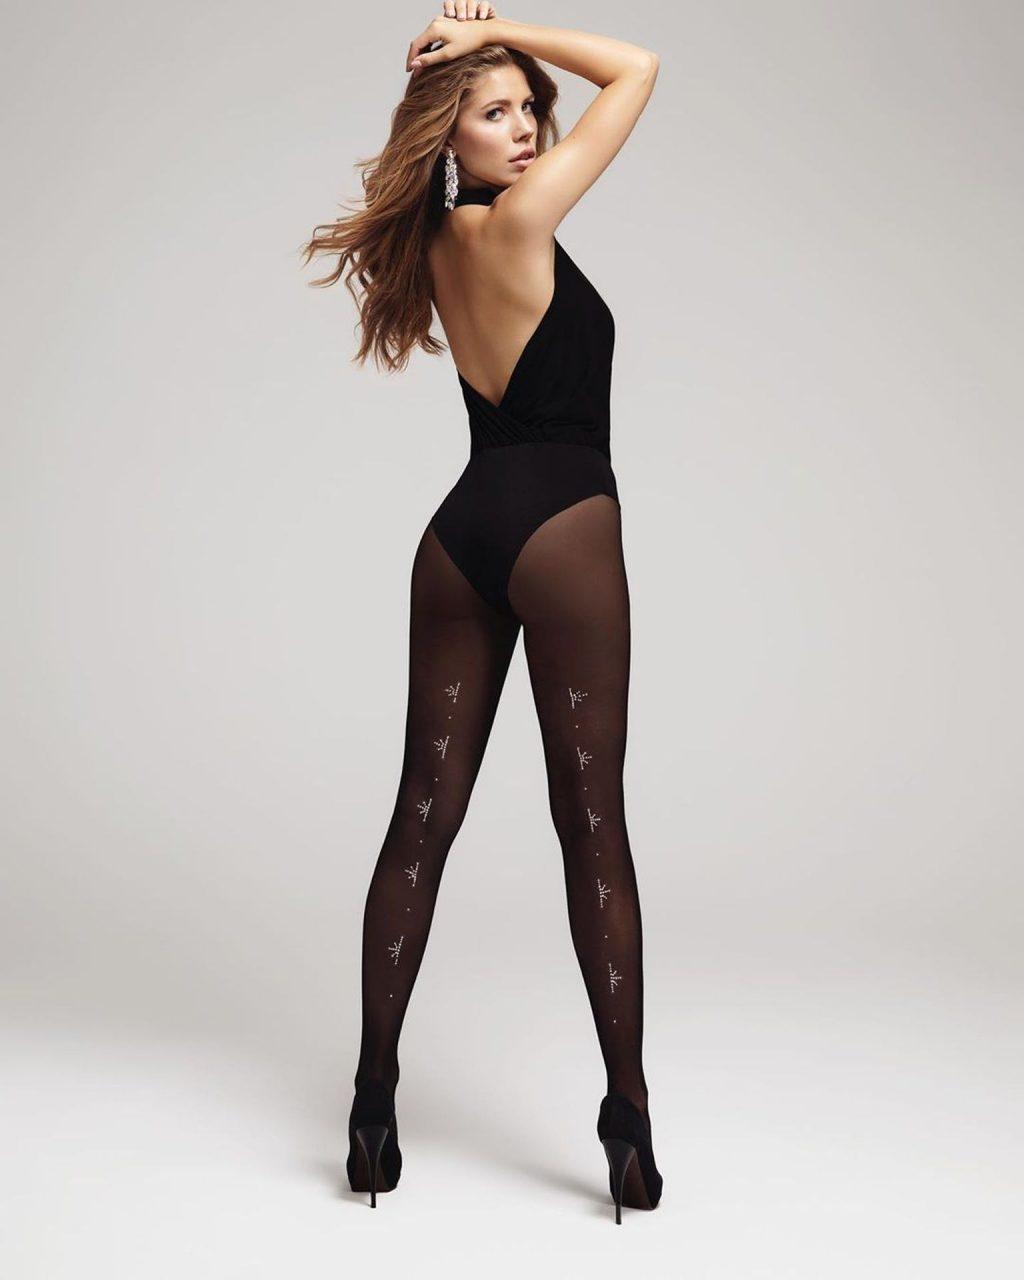 Victoria Swarovski Sexy (42 Photos)